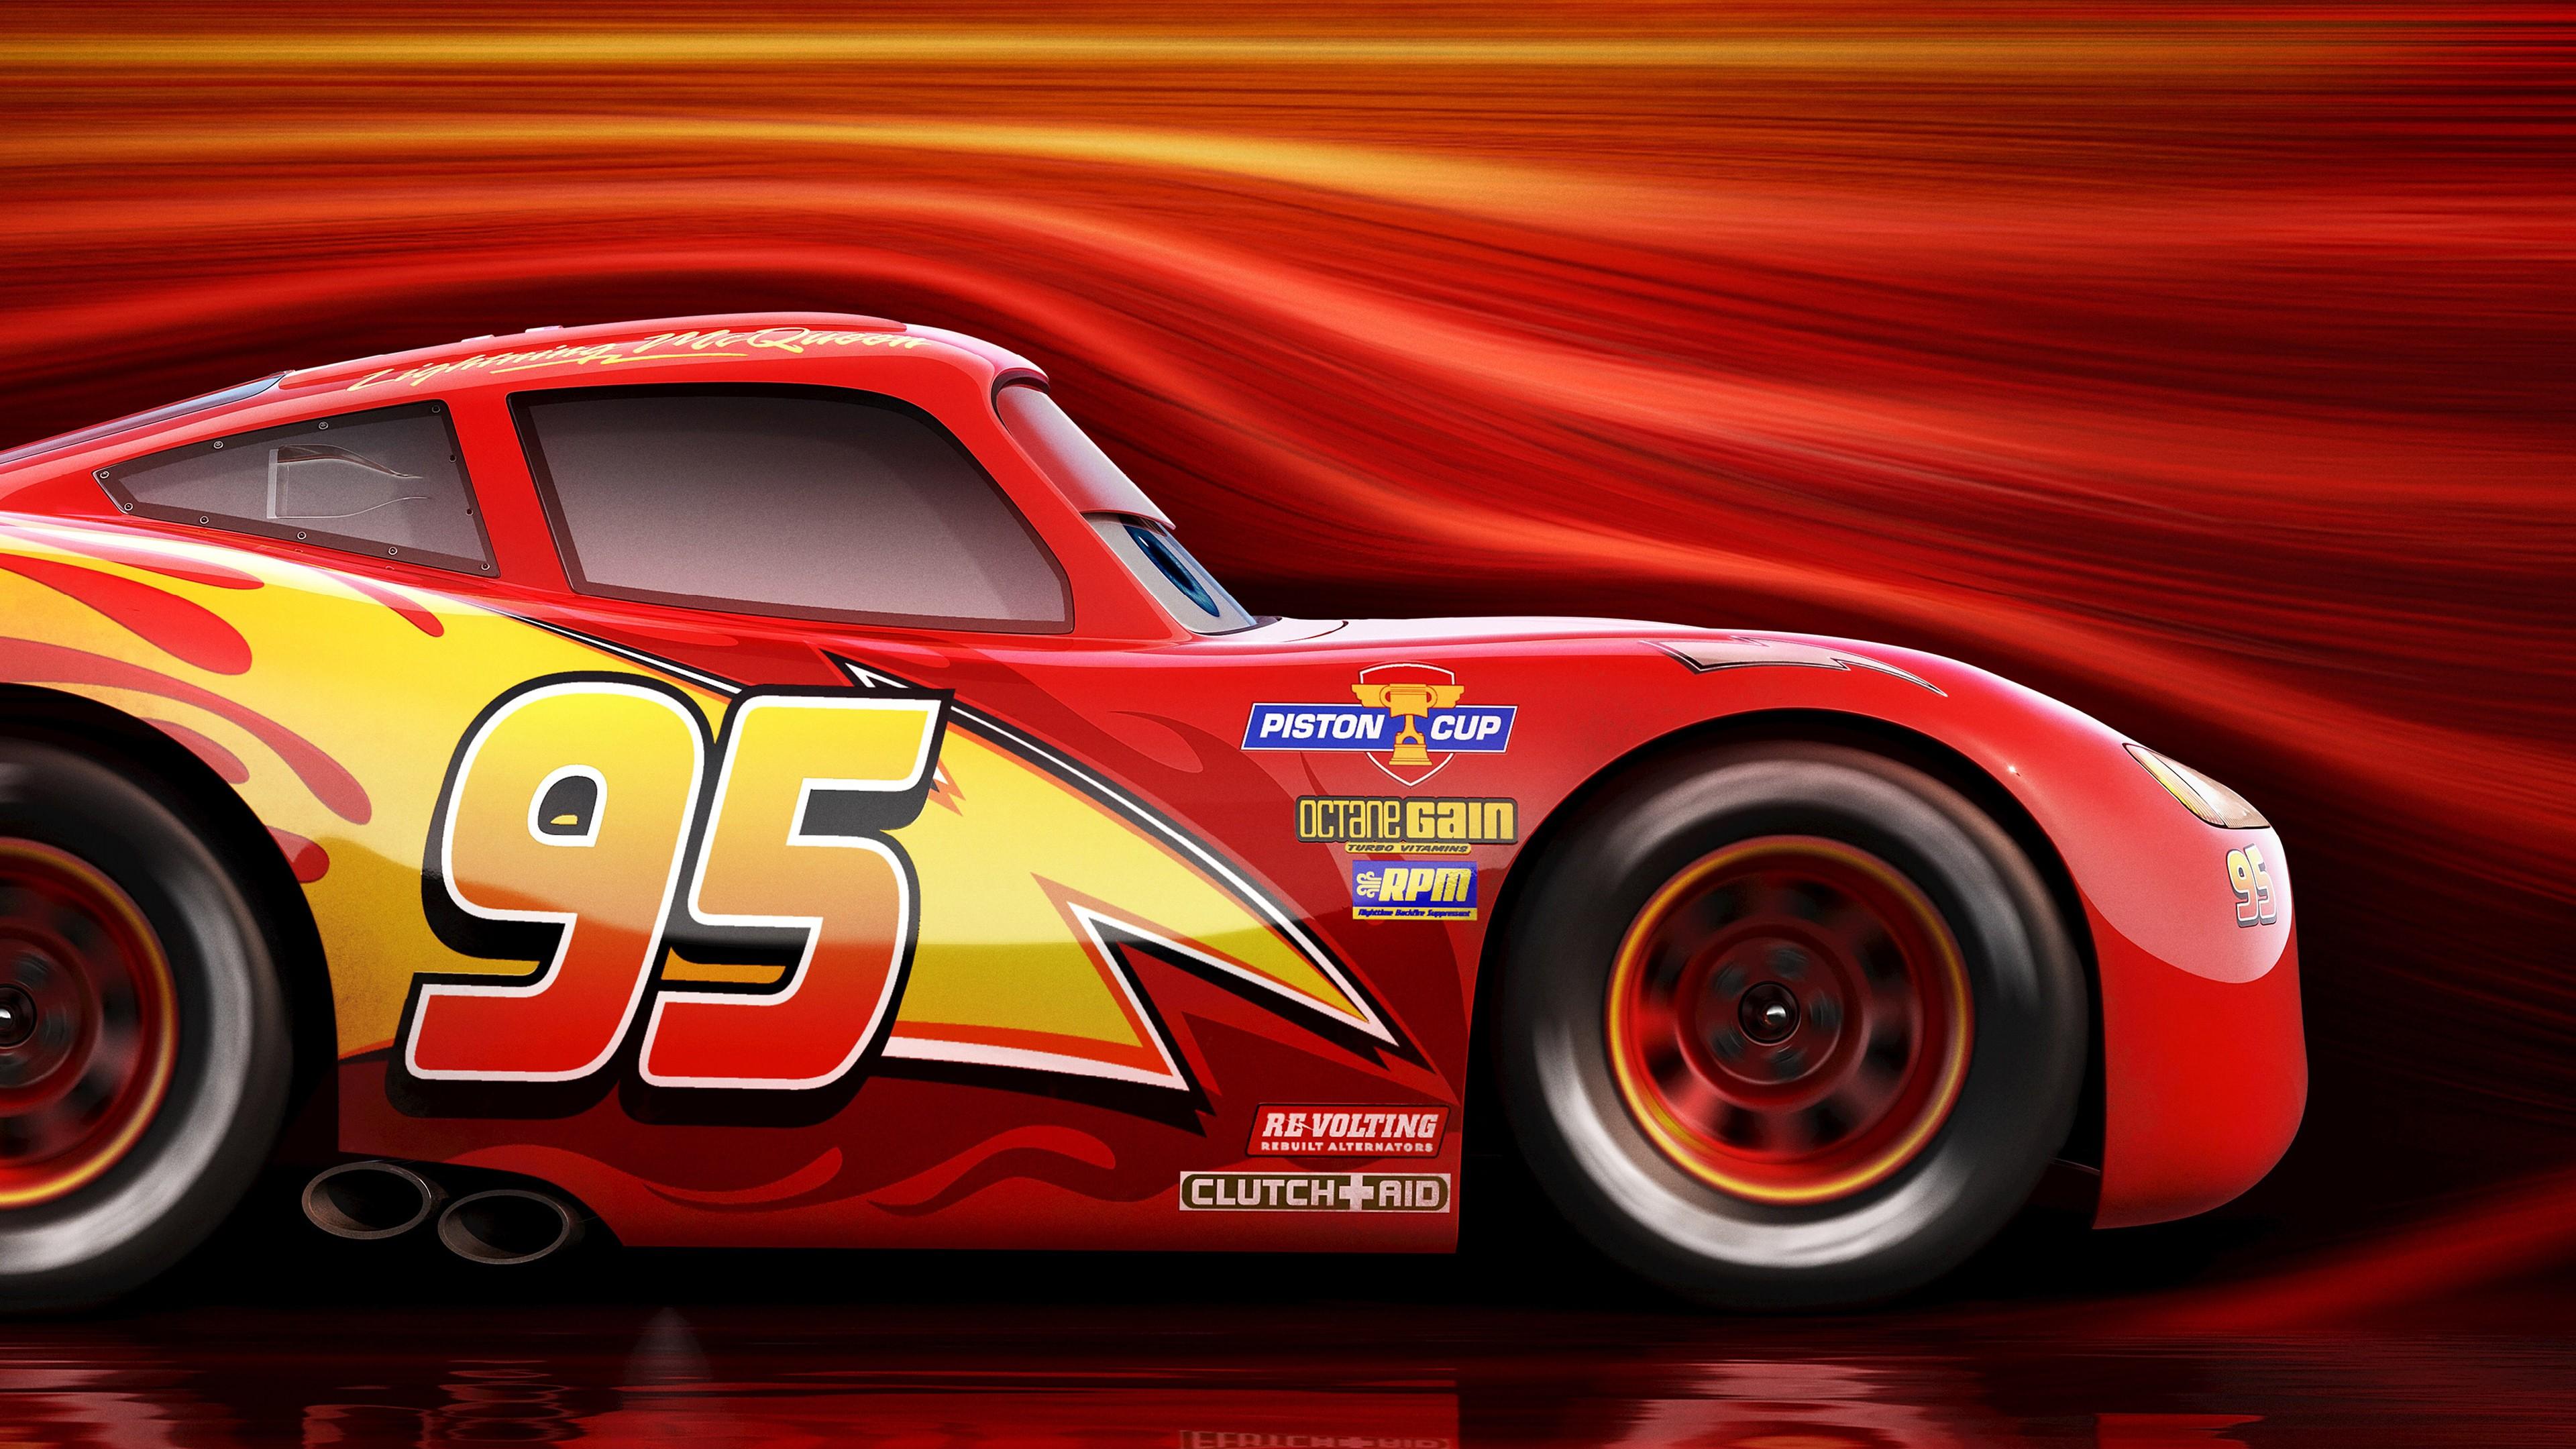 Lightning Mcqueen Cars 3 4K Wallpaper 1080p Wallpaper 3840x2160